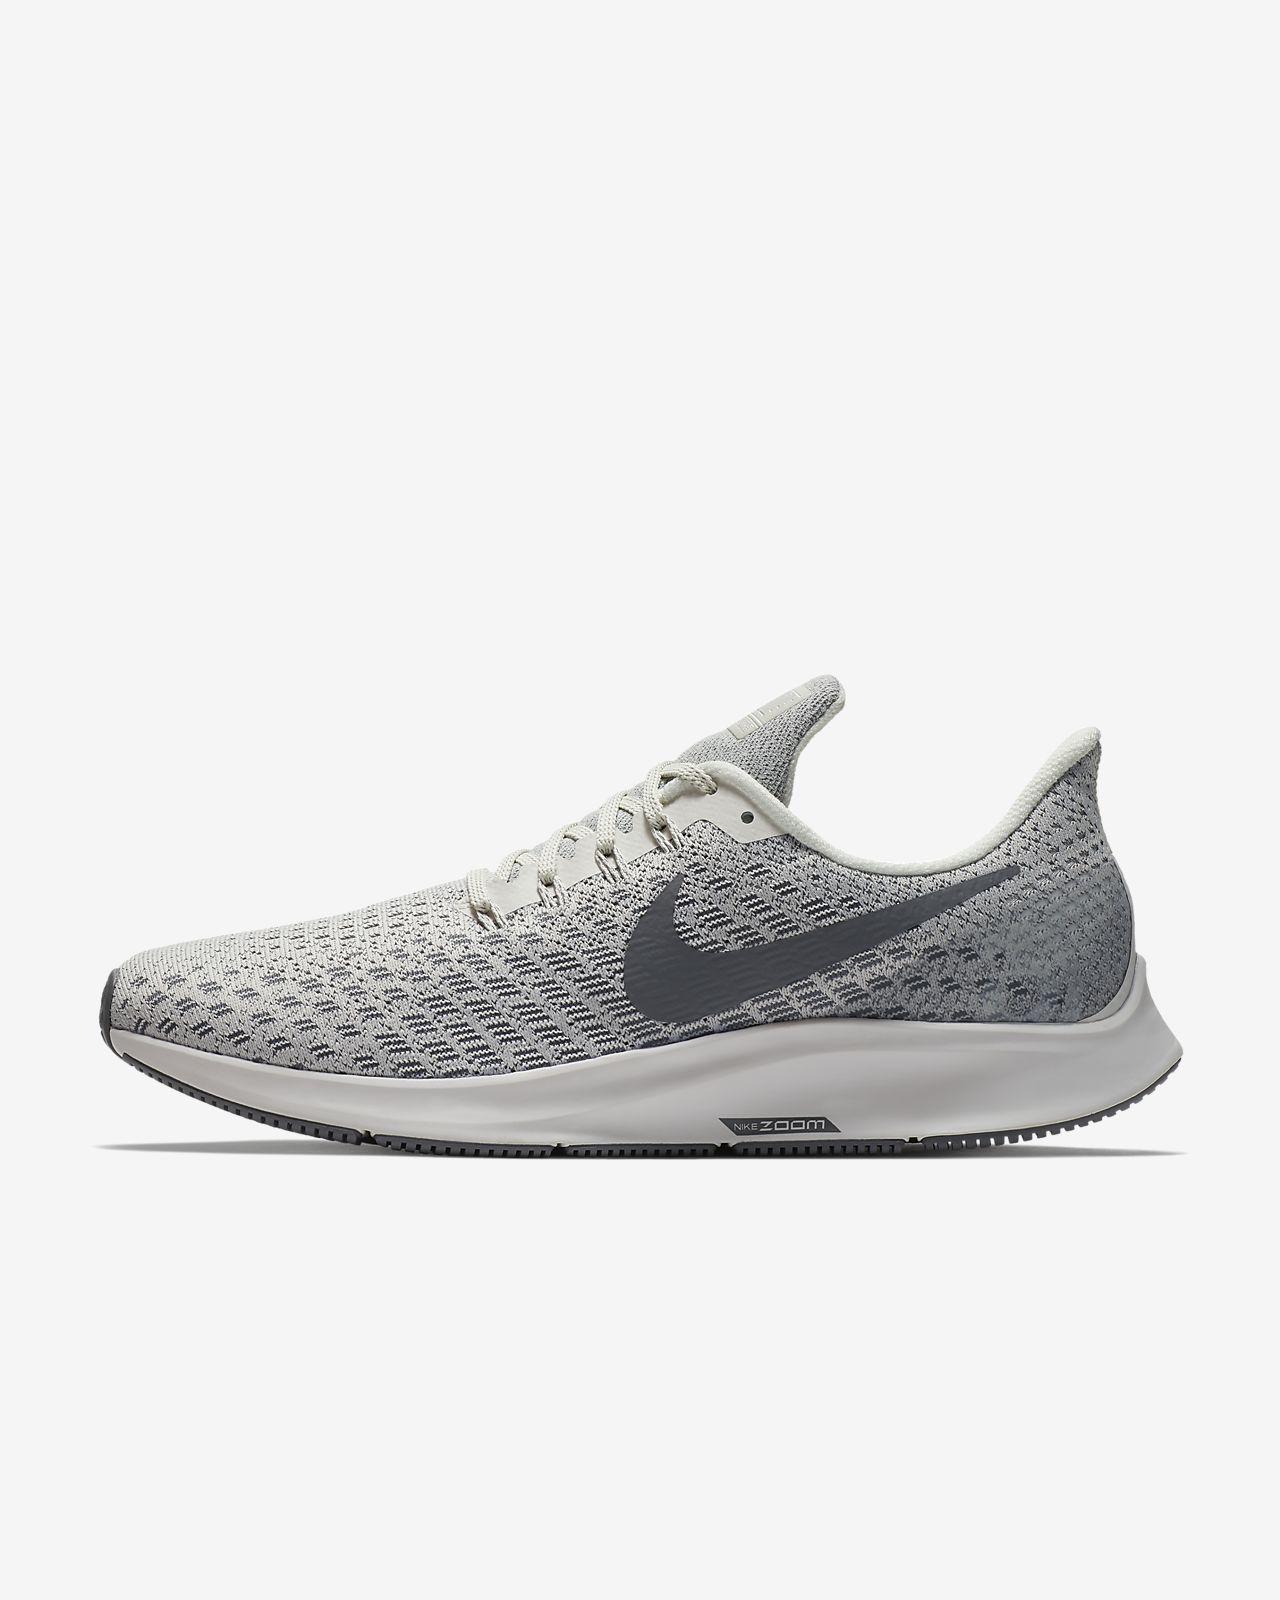 online store f9573 62188 ... Calzado de running para hombre Nike Air Zoom Pegasus 35